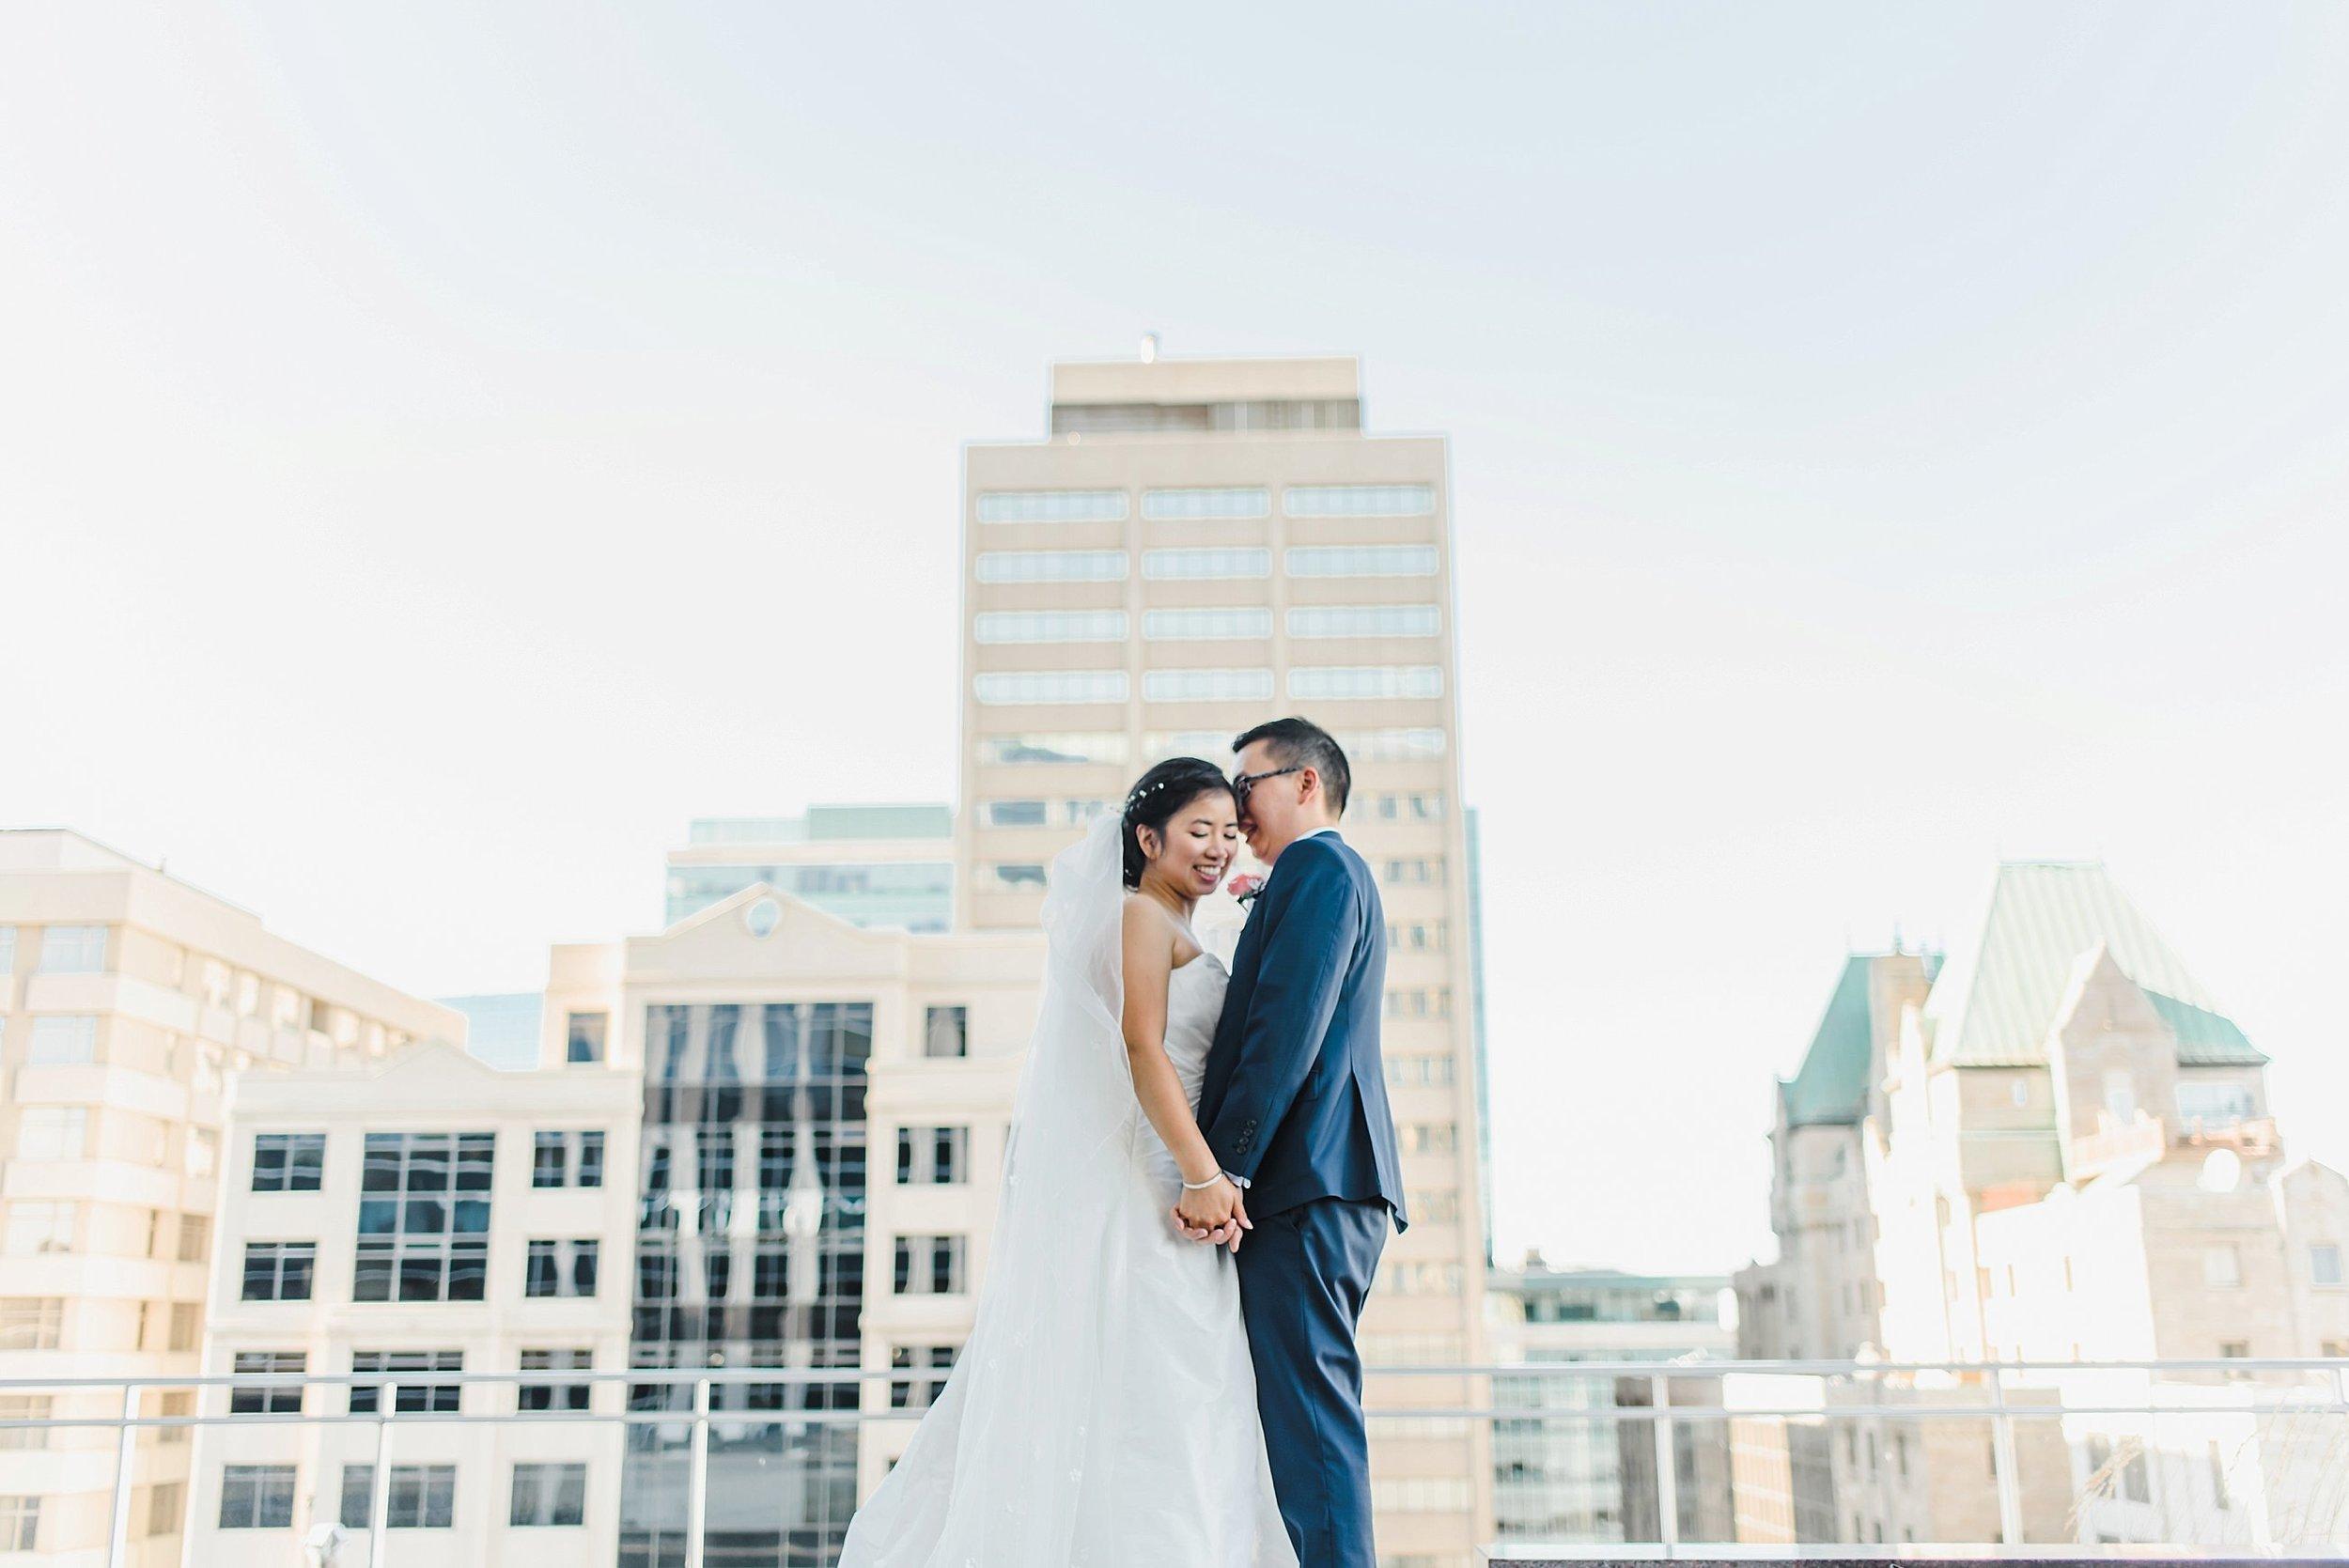 light airy indie fine art ottawa wedding photographer | Ali and Batoul Photography_1525.jpg